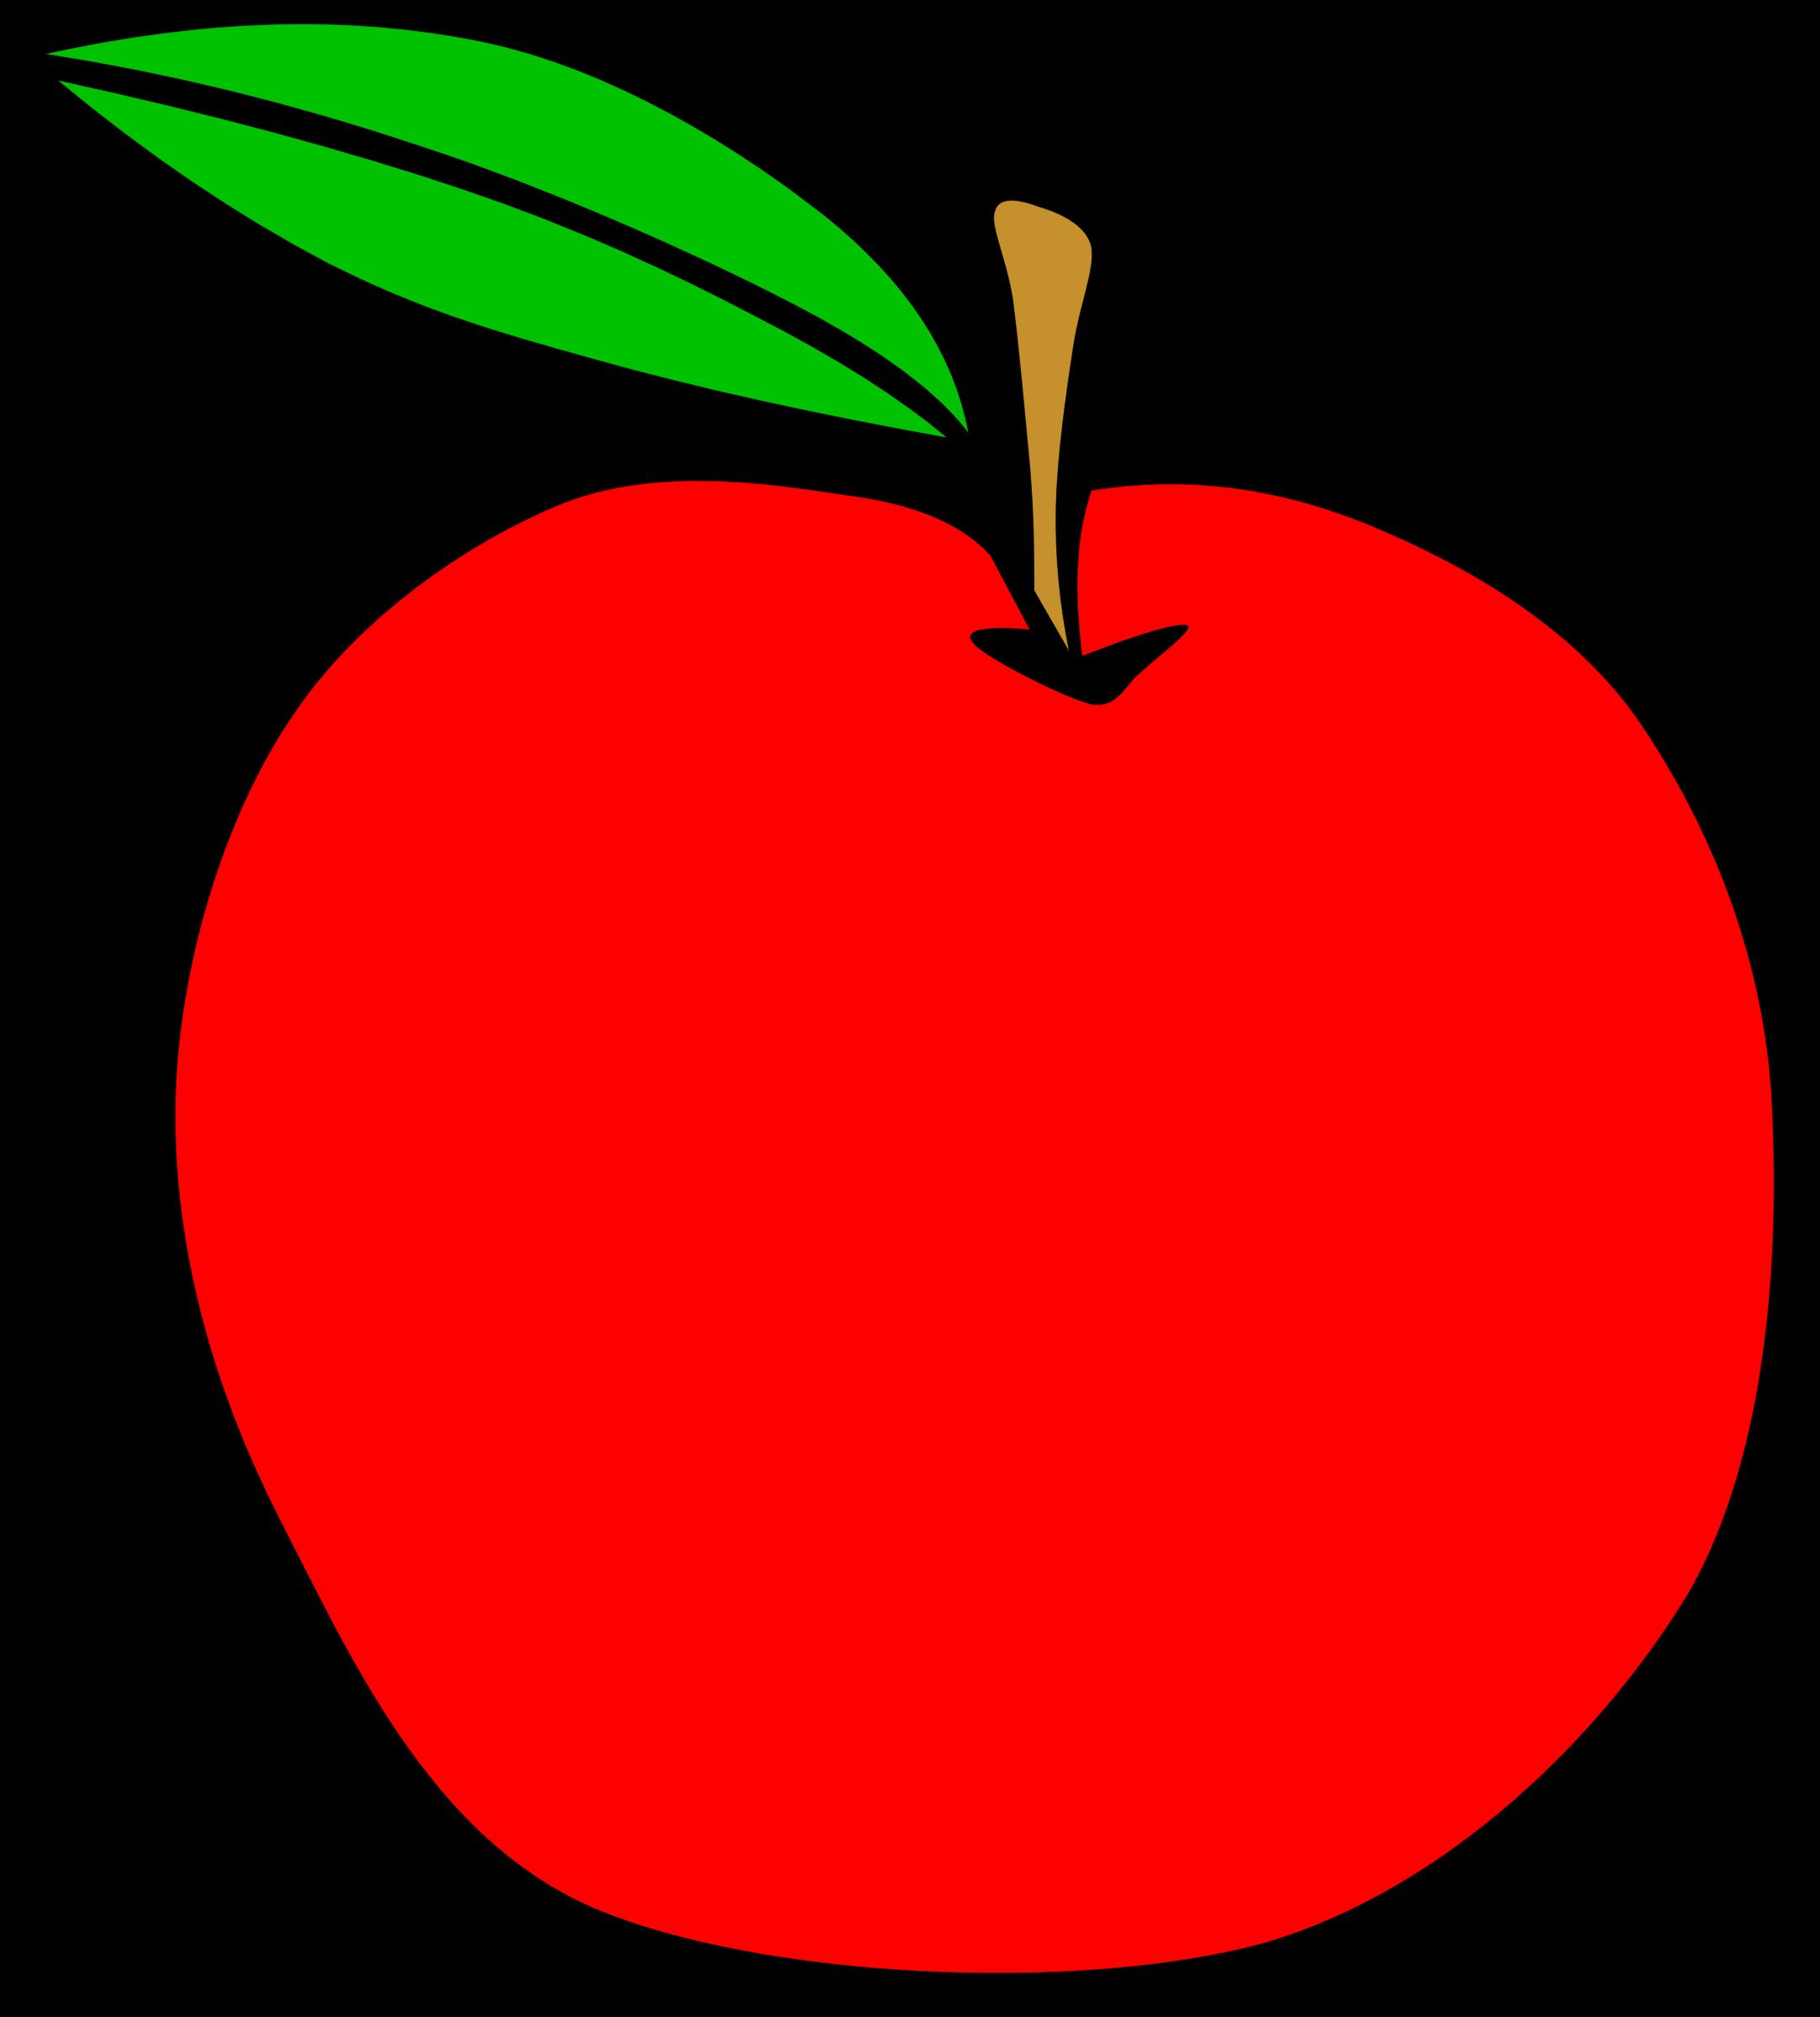 Apple fruit. Clipart of clip art